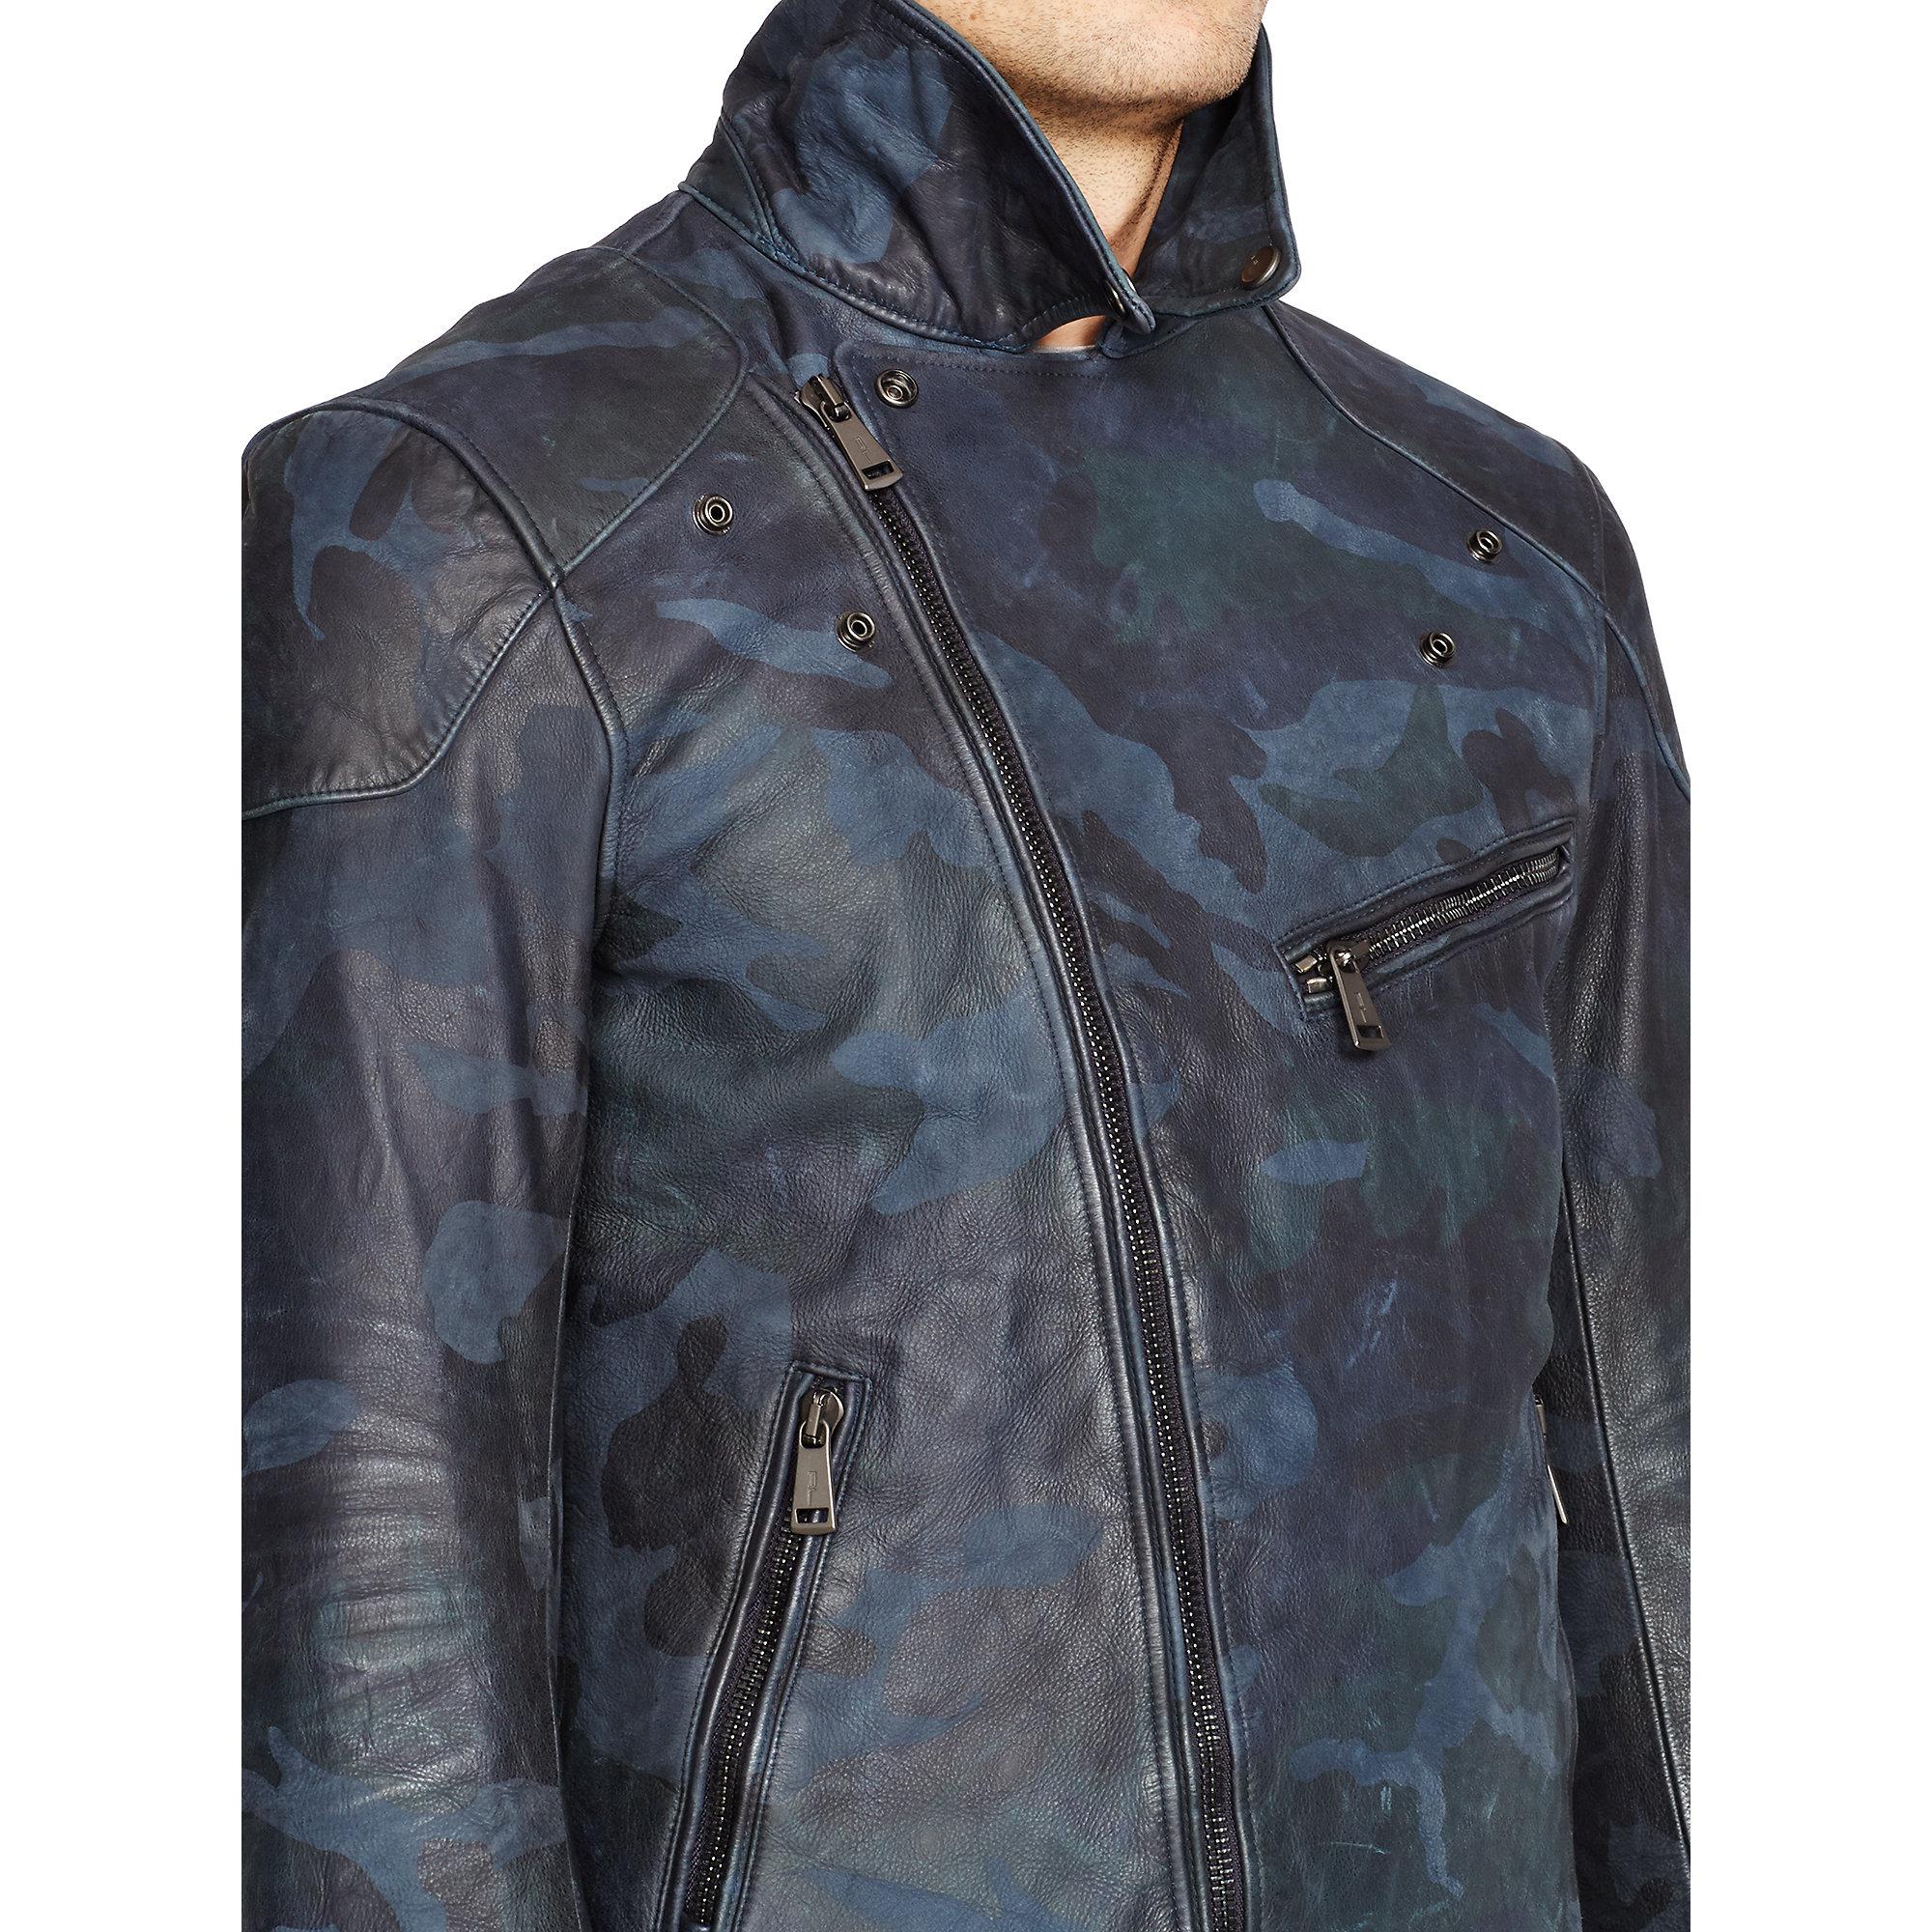 Black Biker Jacket Mens >> Ralph lauren black label Camo Leather Biker Jacket in Blue for Men   Lyst